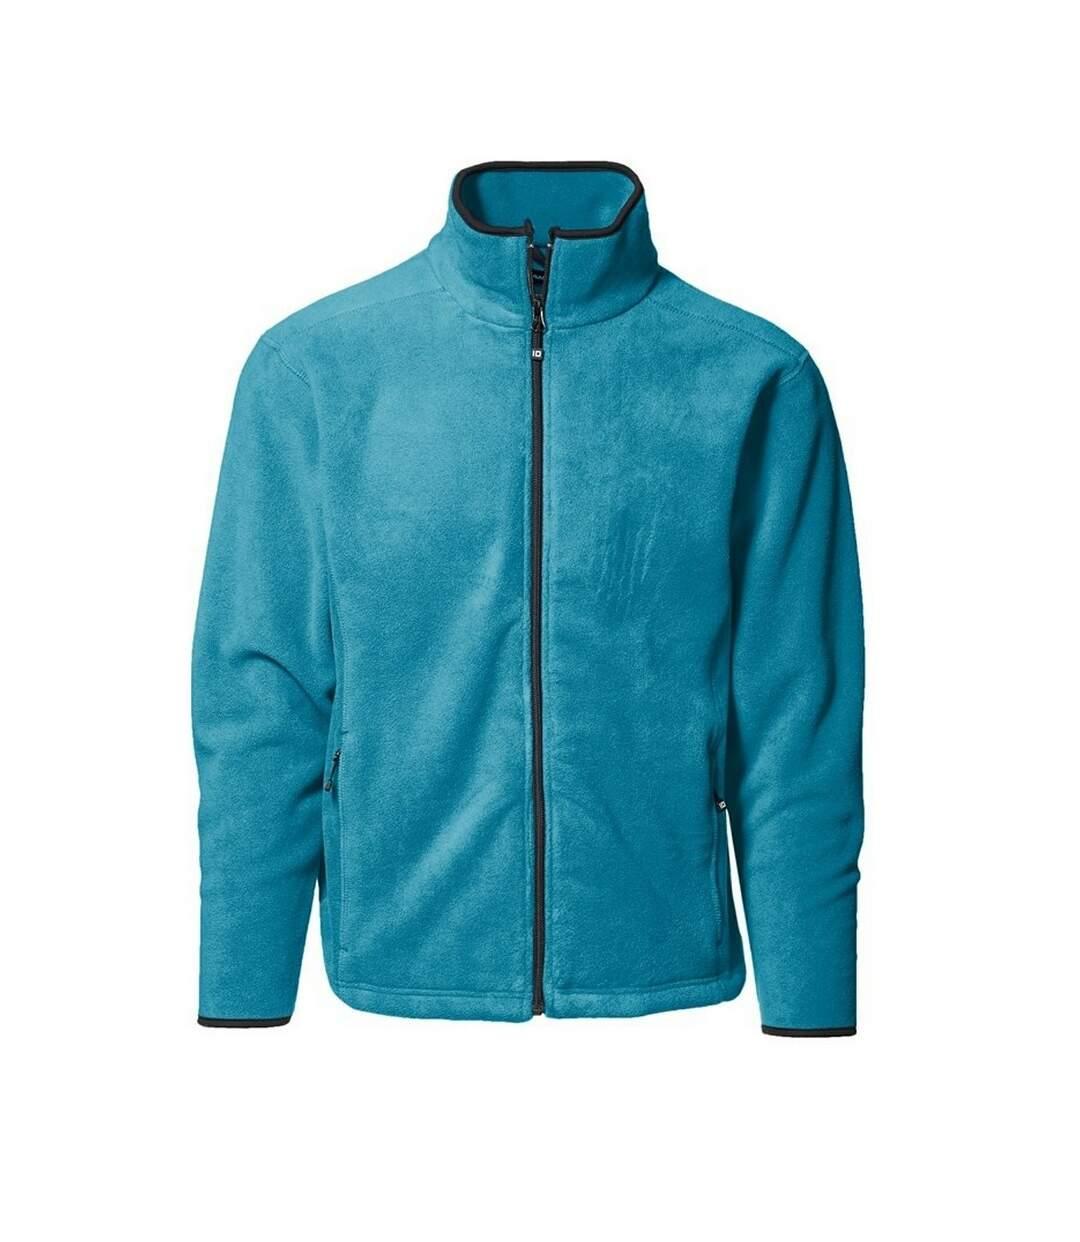 ID Mens Microfleece Regular Fitting Full Zip Jacket (Turquoise) - UTID350